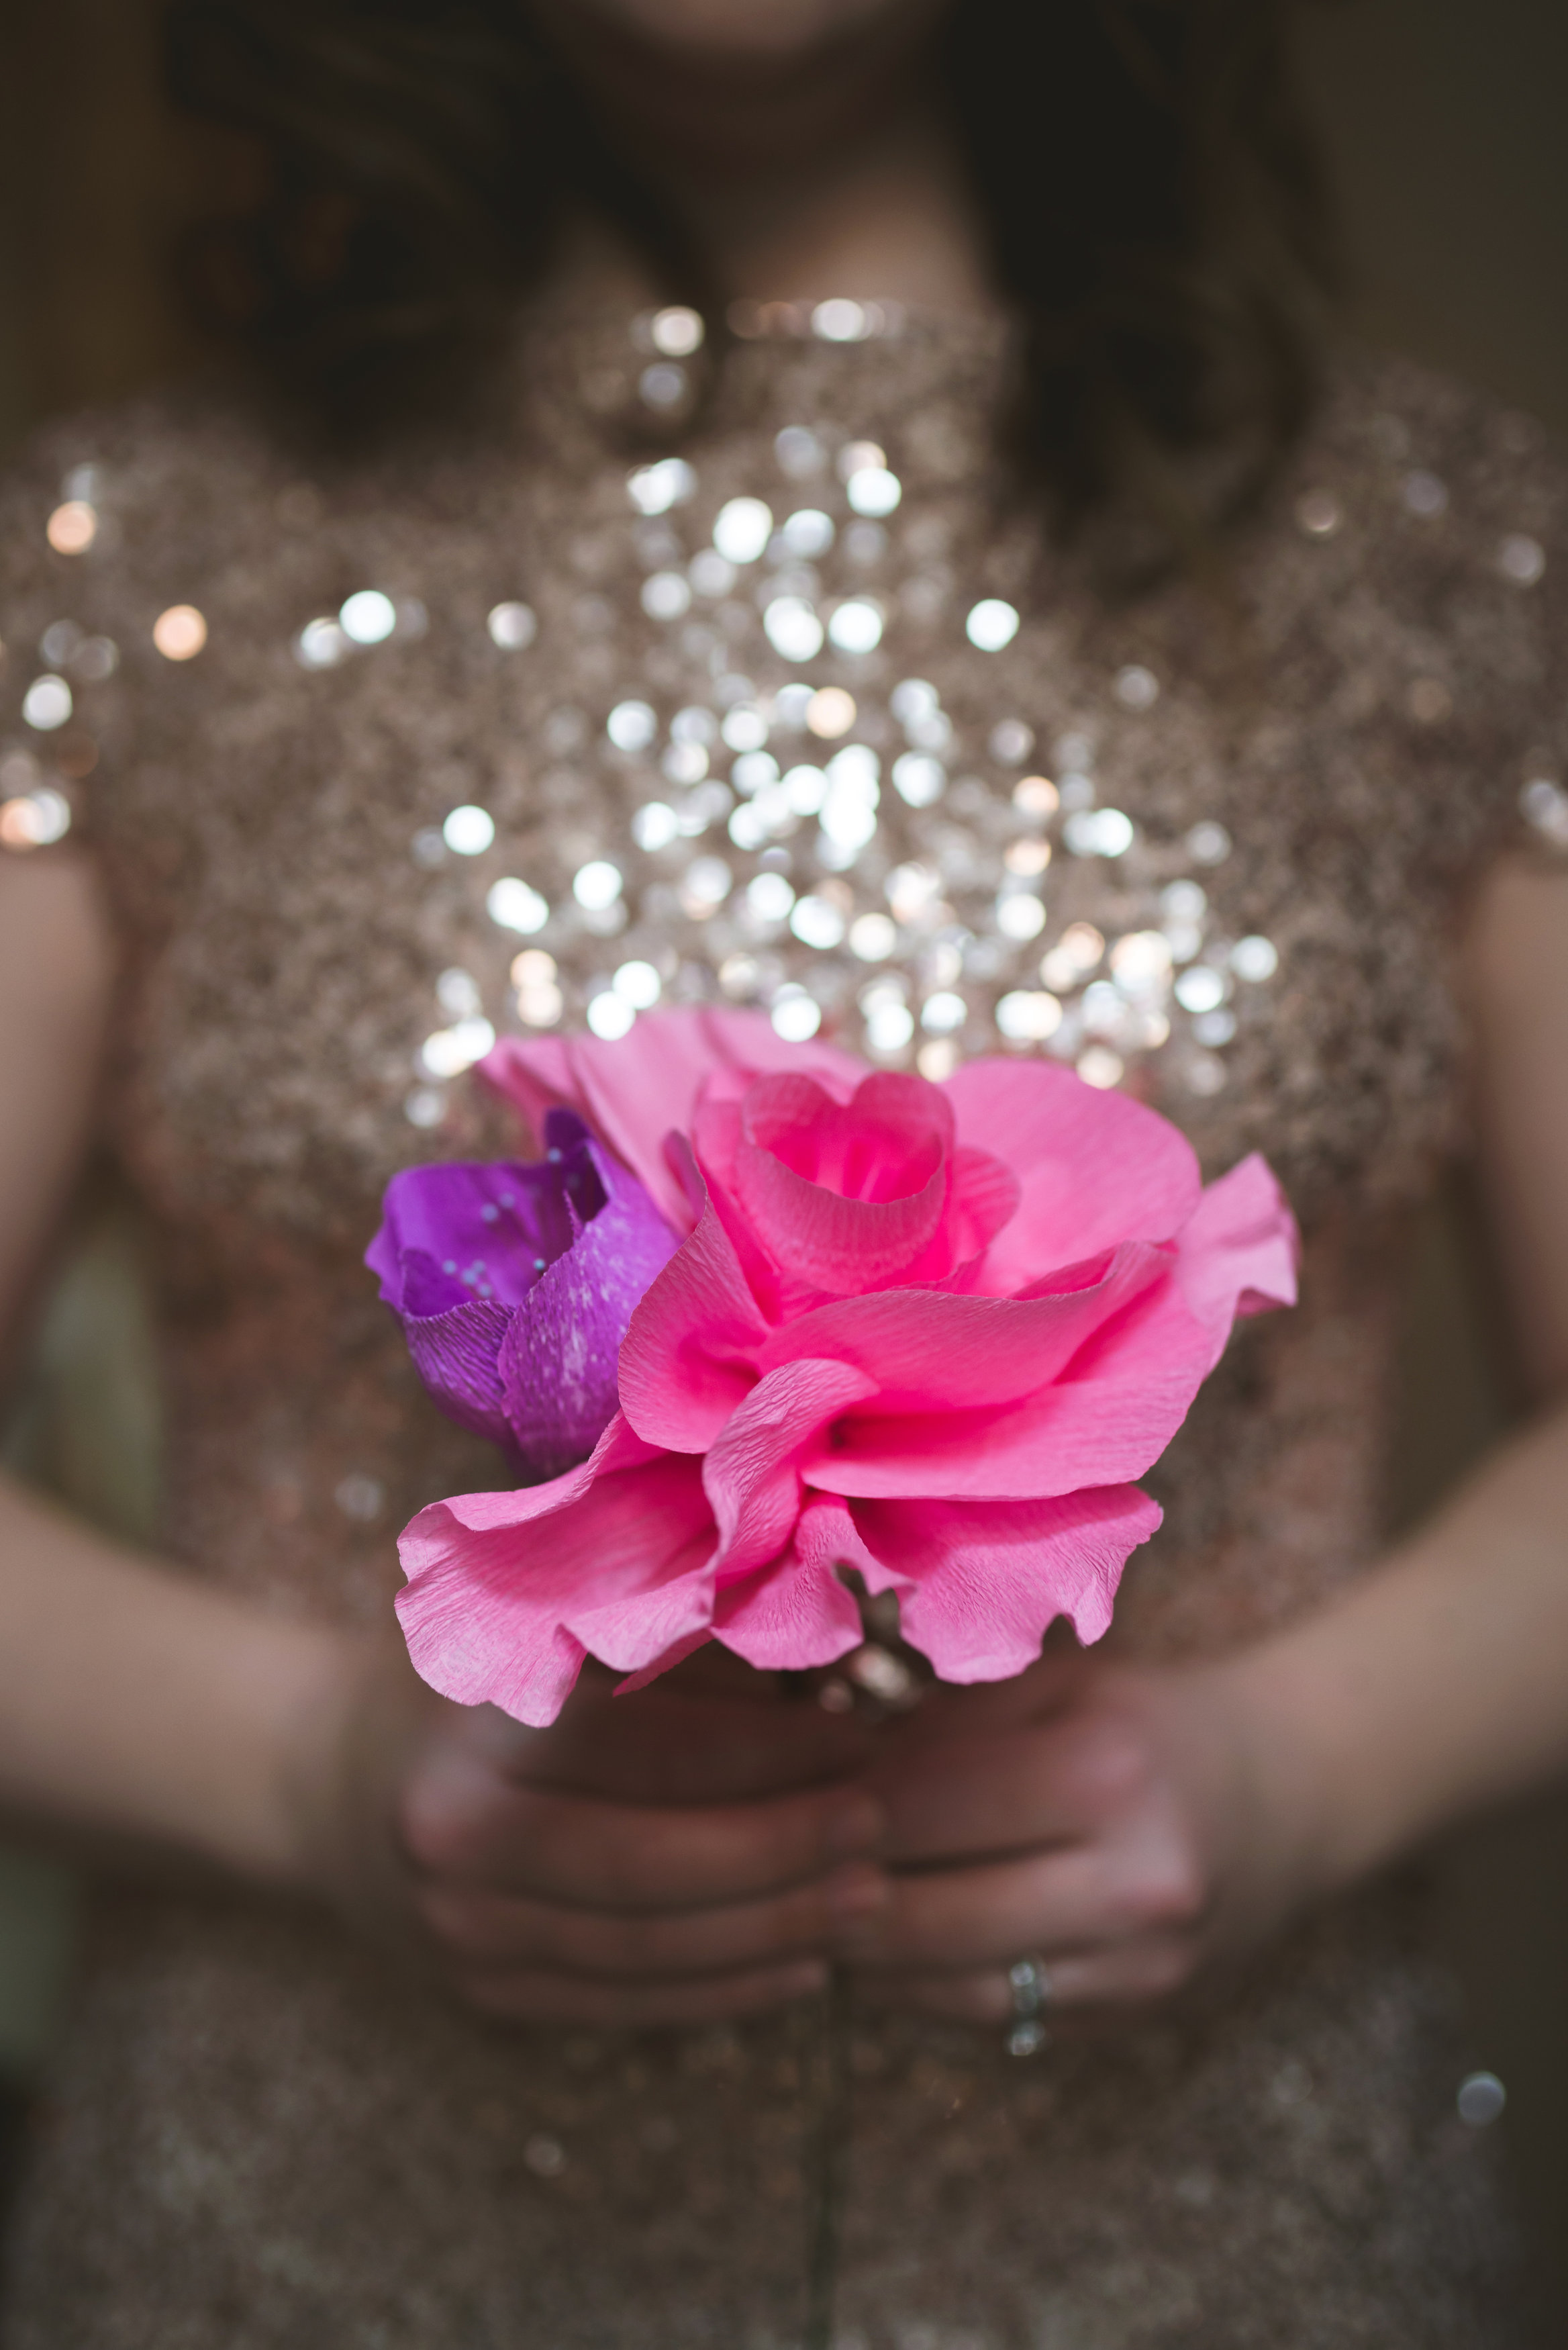 The Party Concierge - Philadelphia Party Planning - Concierge - Events - Weddings - Coordination - S